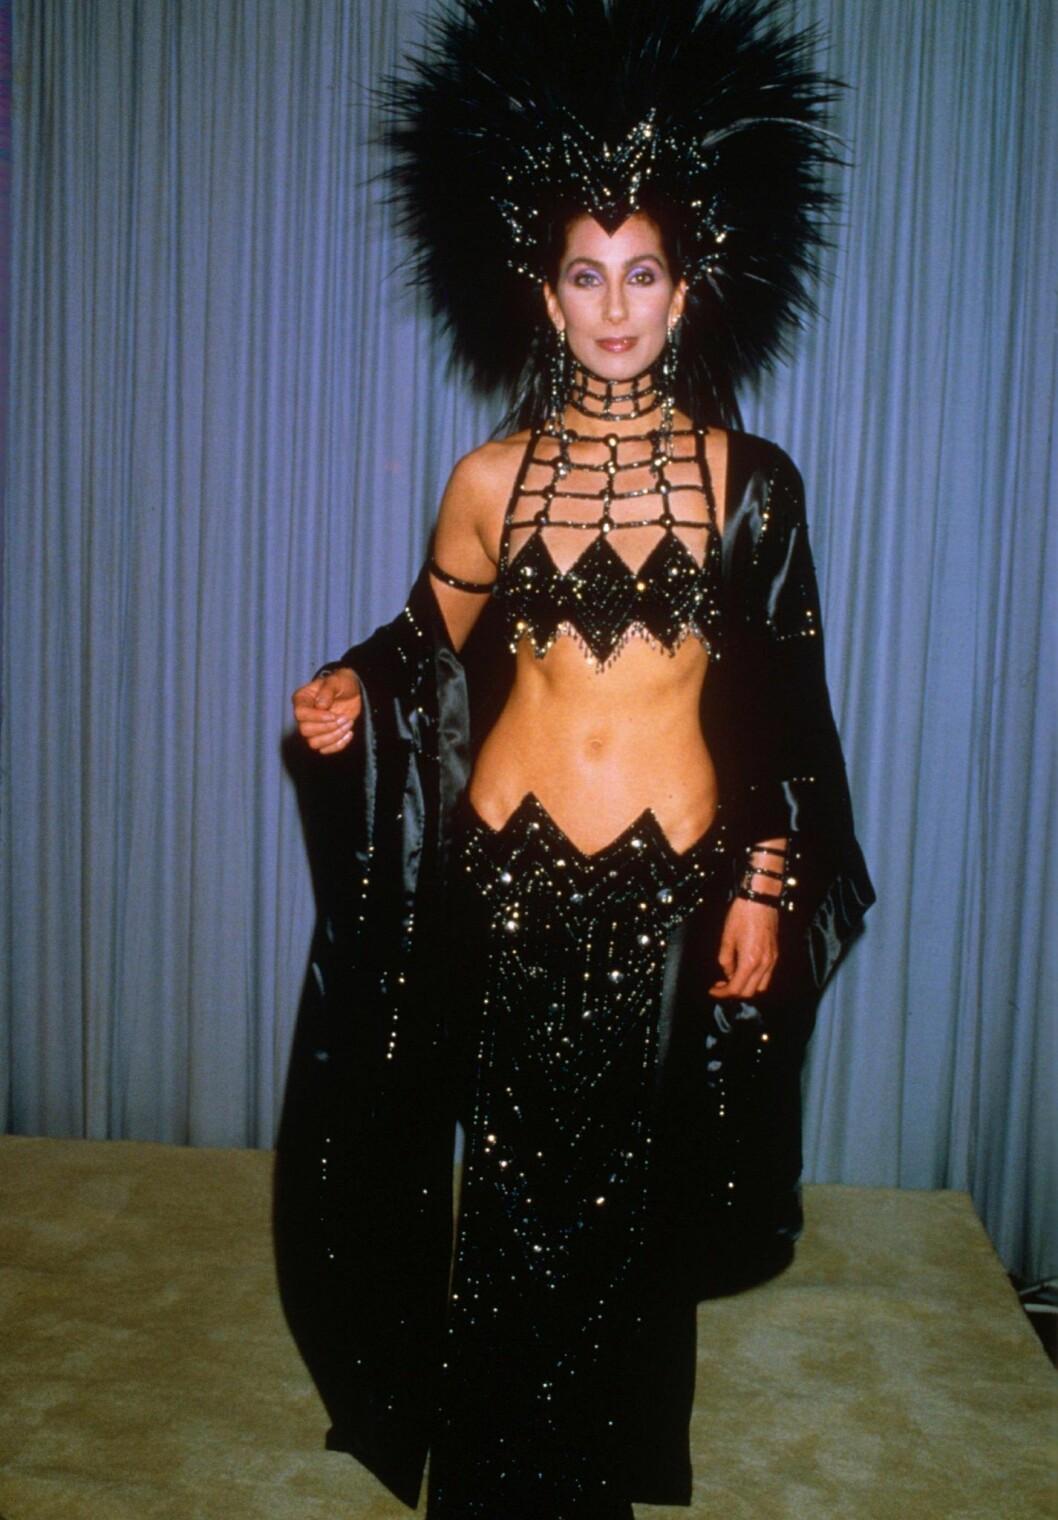 Cher i en svart glittrig showgirl kreation med en stor fjäderdekoration i håret.